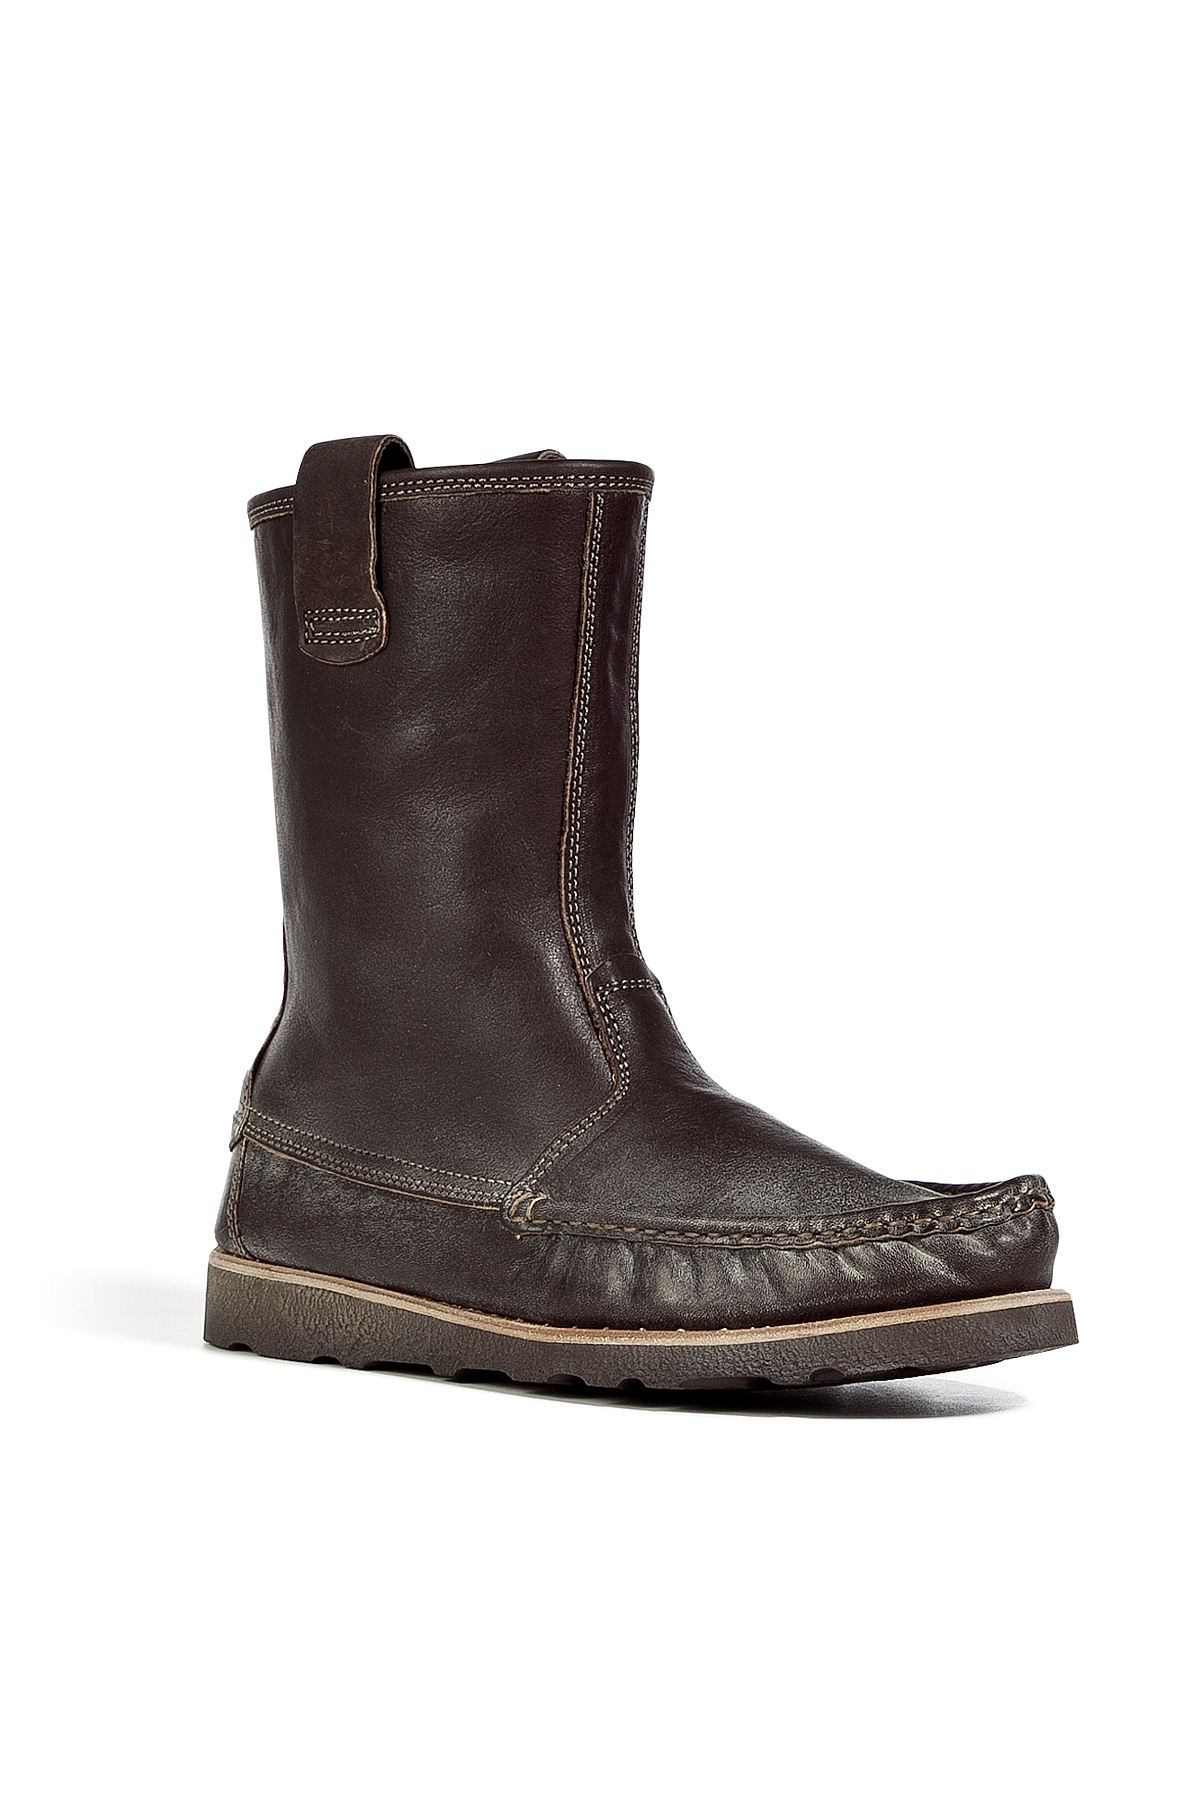 Lyst Ndc Brown Moccasin Nebraska Boots In Brown For Men